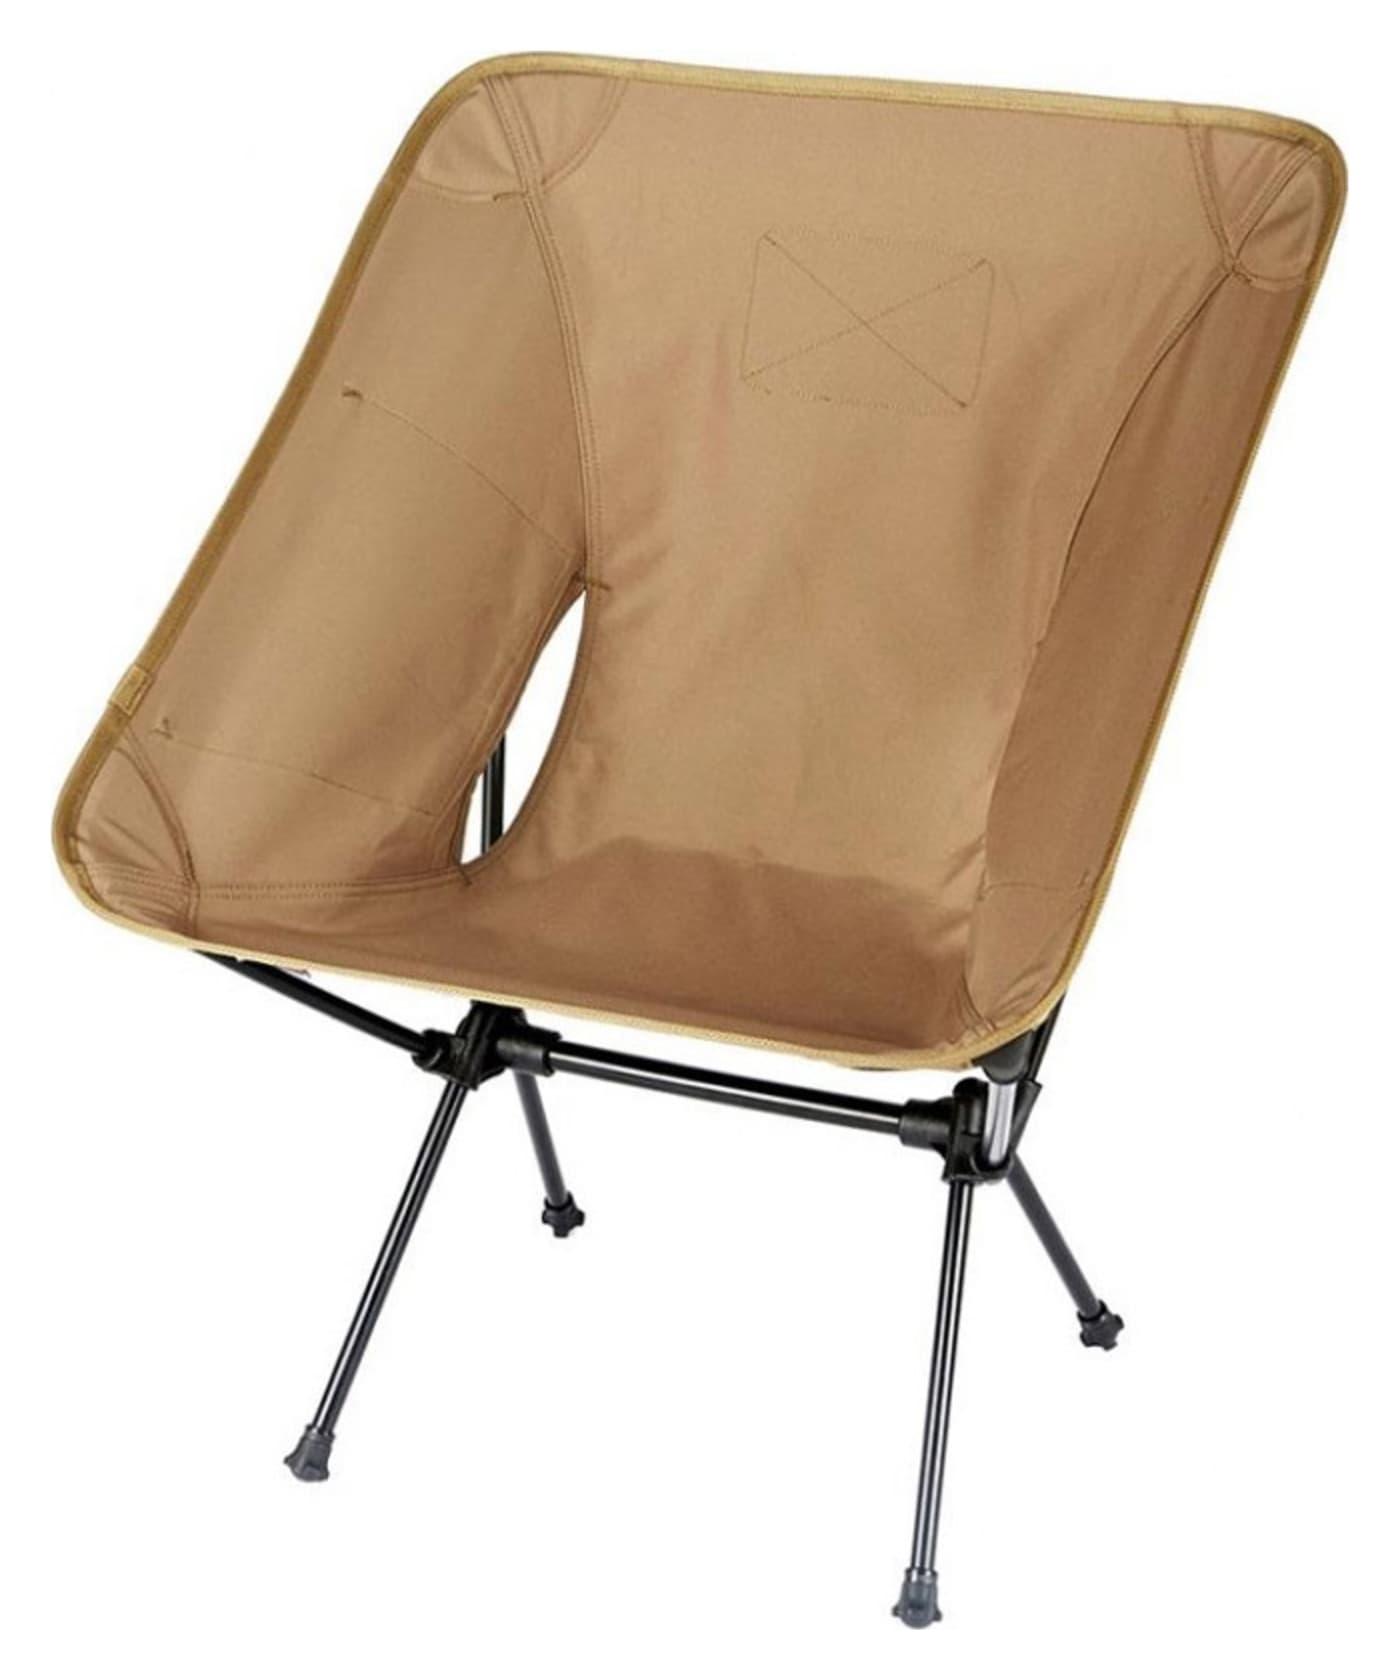 big agnes helinox chair high back folding one tactical coyote tan 25l